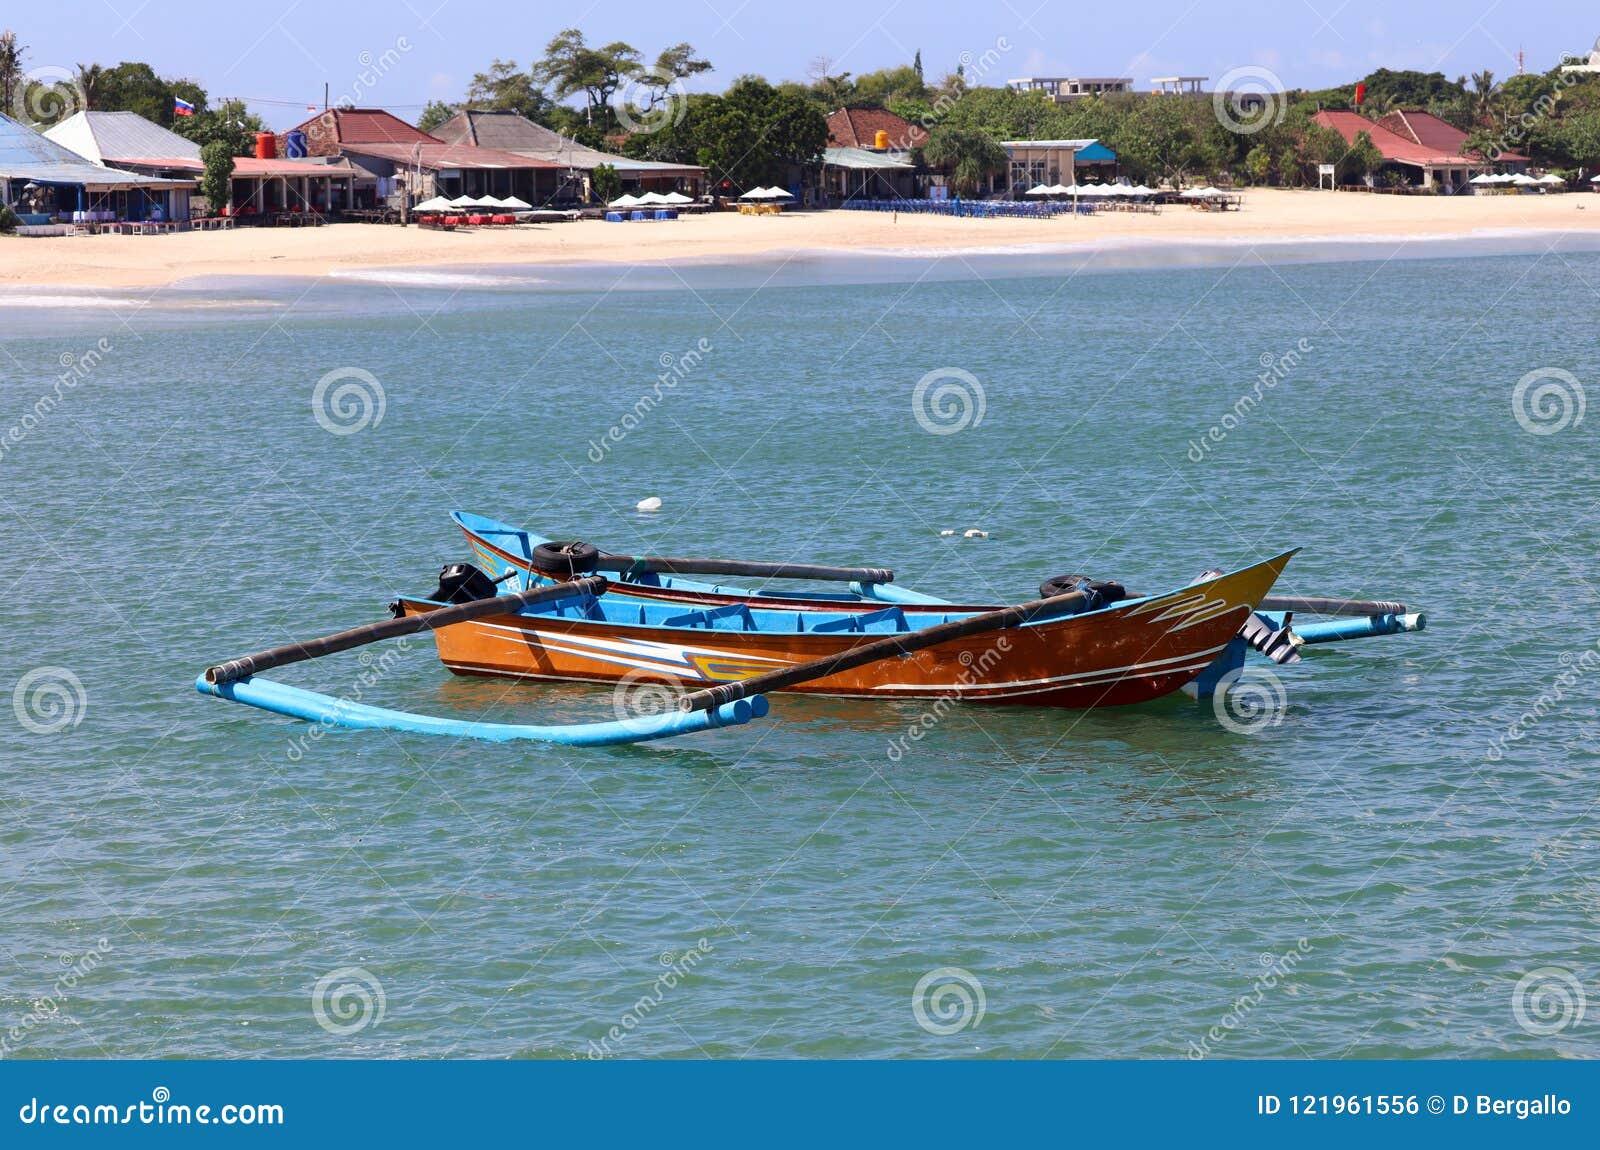 Beautiful picture of fishing boats at Jimbaran Bay at Bali Indonesia, beach, ocean, fishing boats and airport in photo.